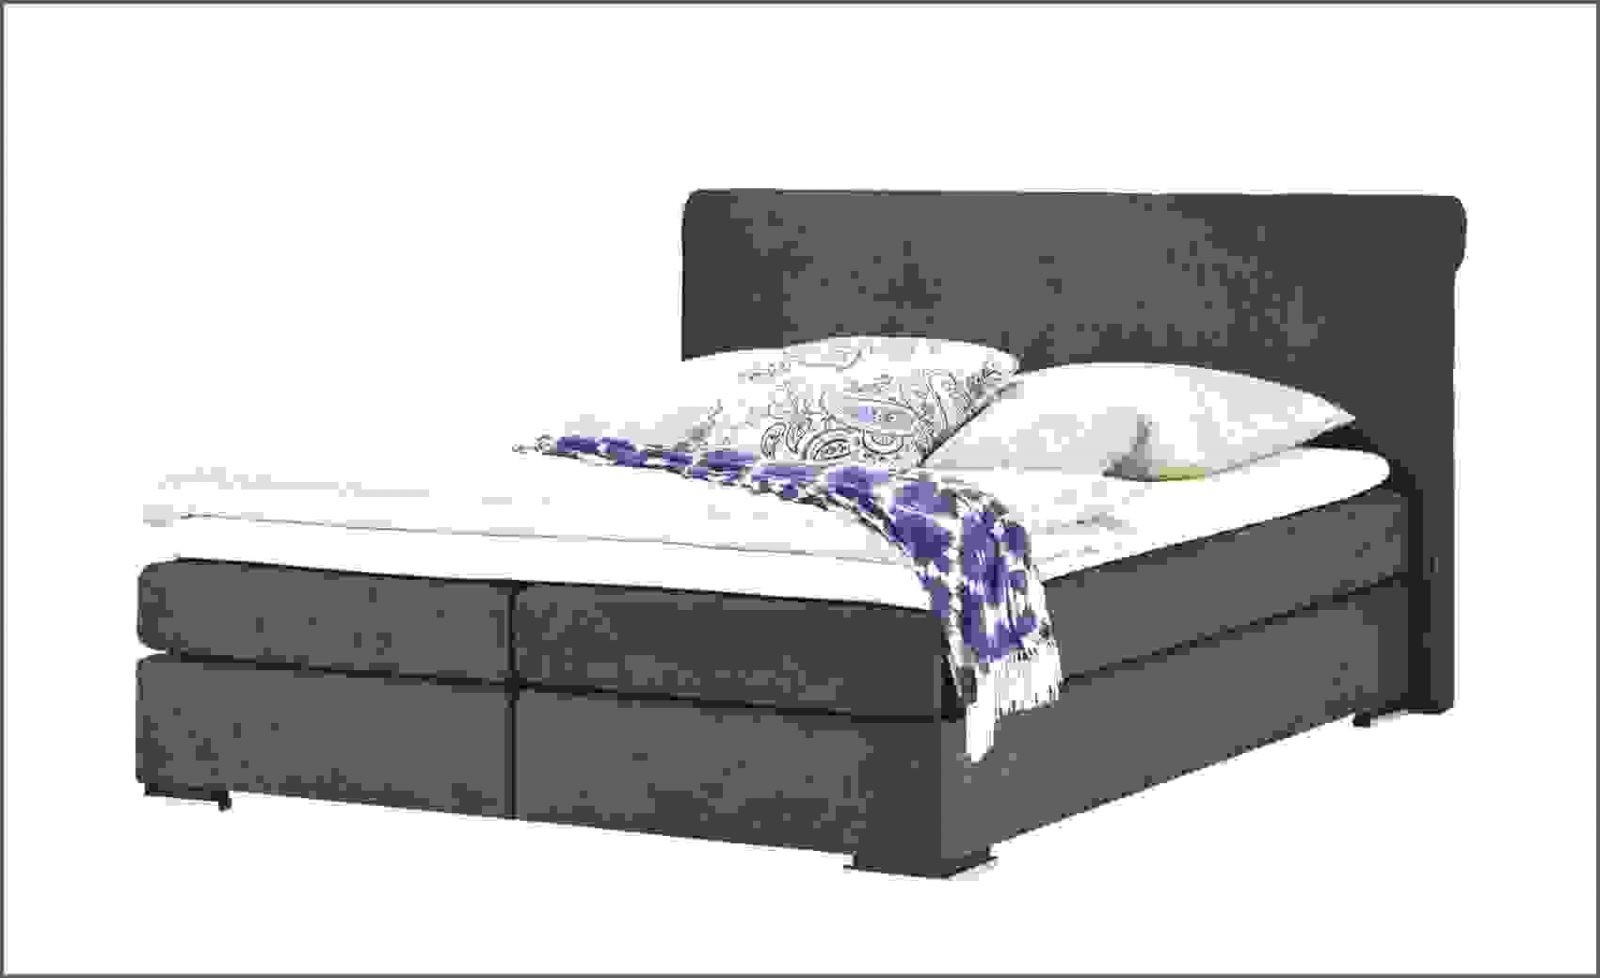 Wunderschöne Ideen Smart Boxspringbett Luxus Von Höffner Und Von von Smart Boxspringbett Luxus Bild